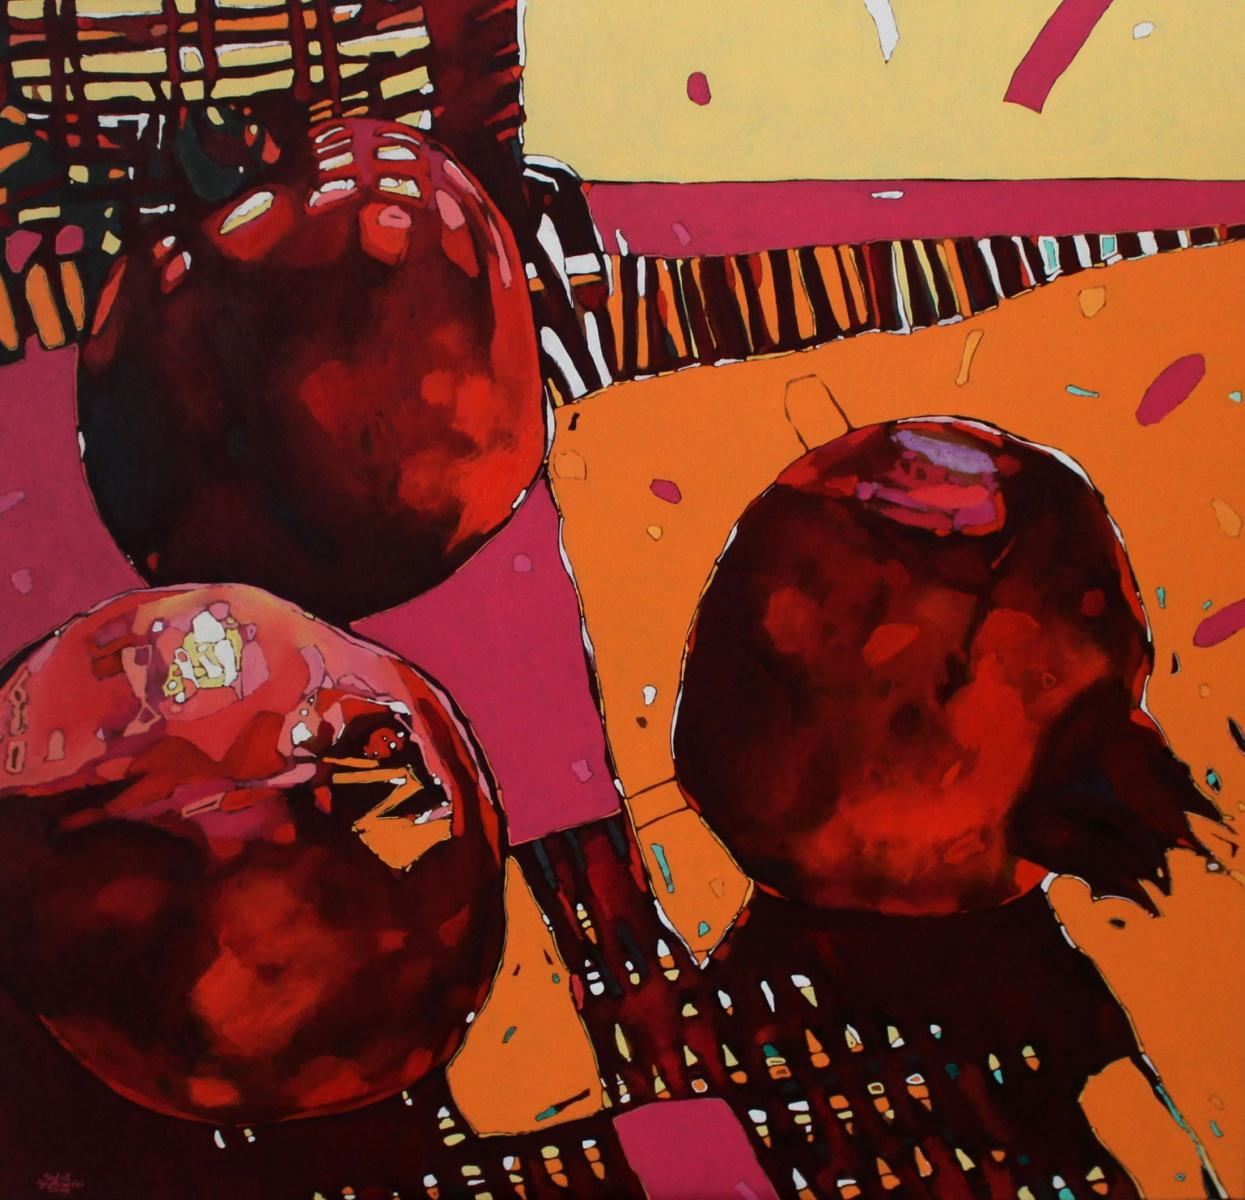 Pomegranates 08 - XXI Century, Oil painting, Contemporary Figurative, Fruits